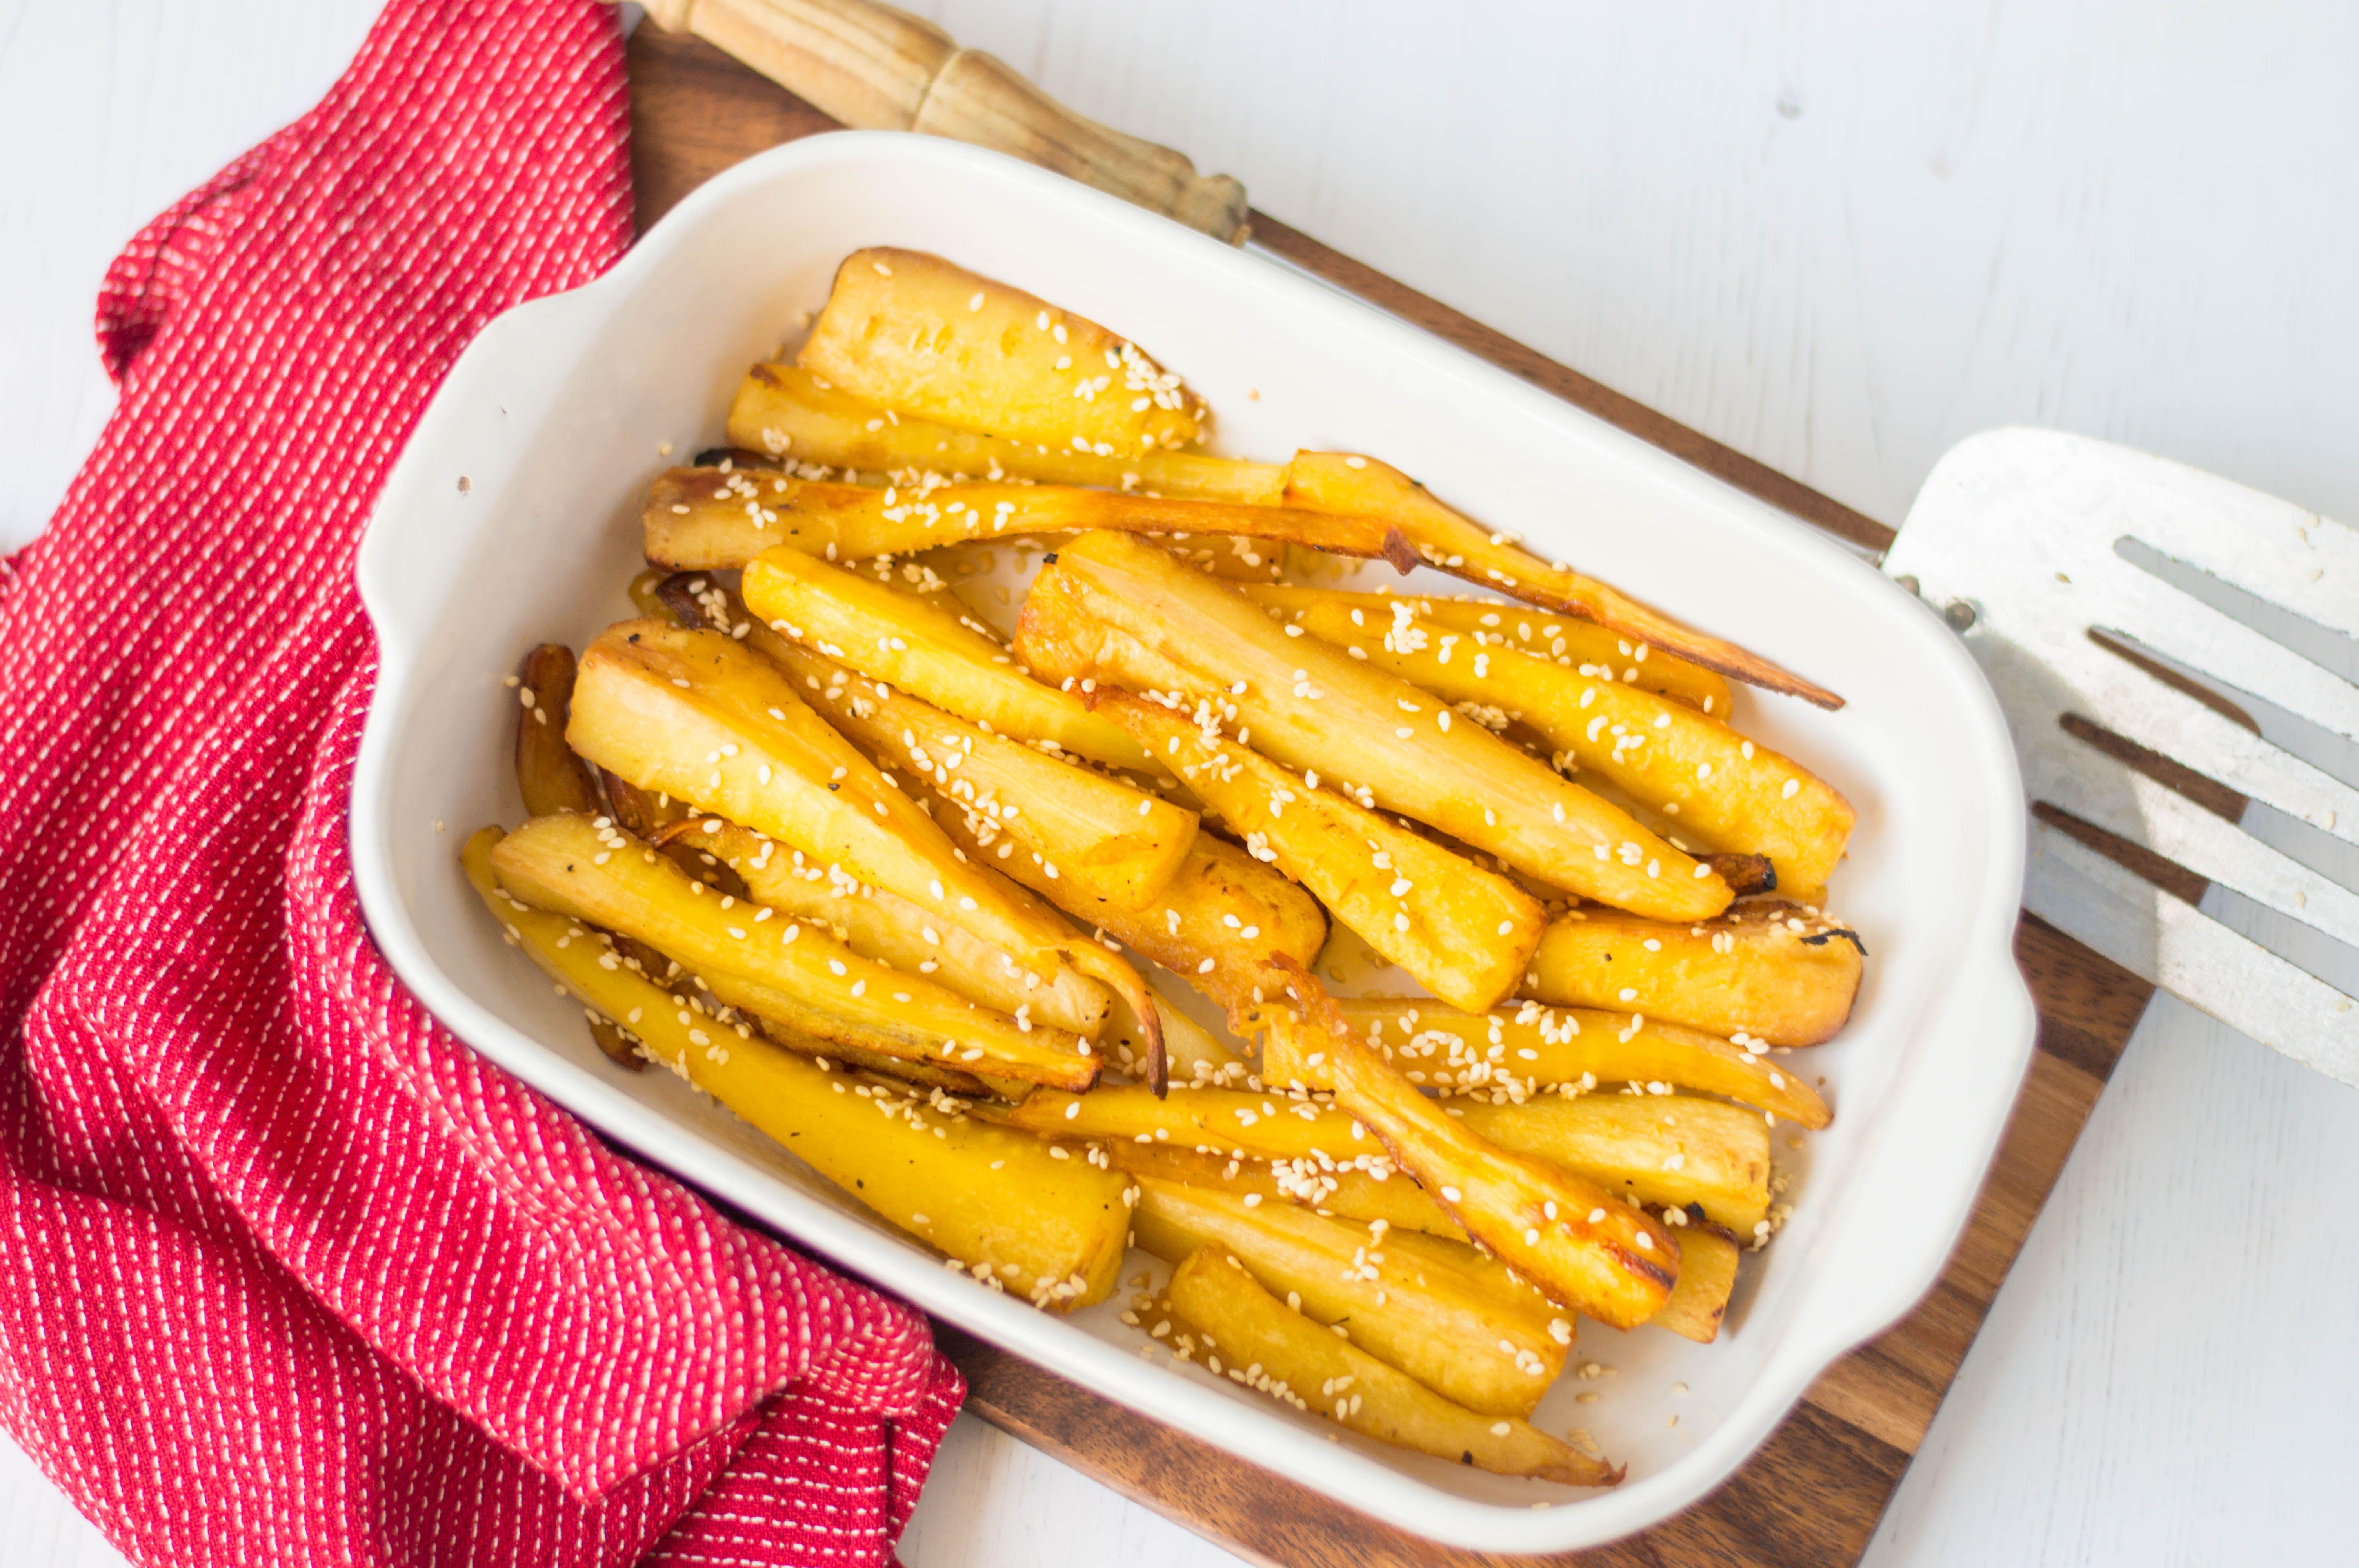 Maple-glazed roast parsnips